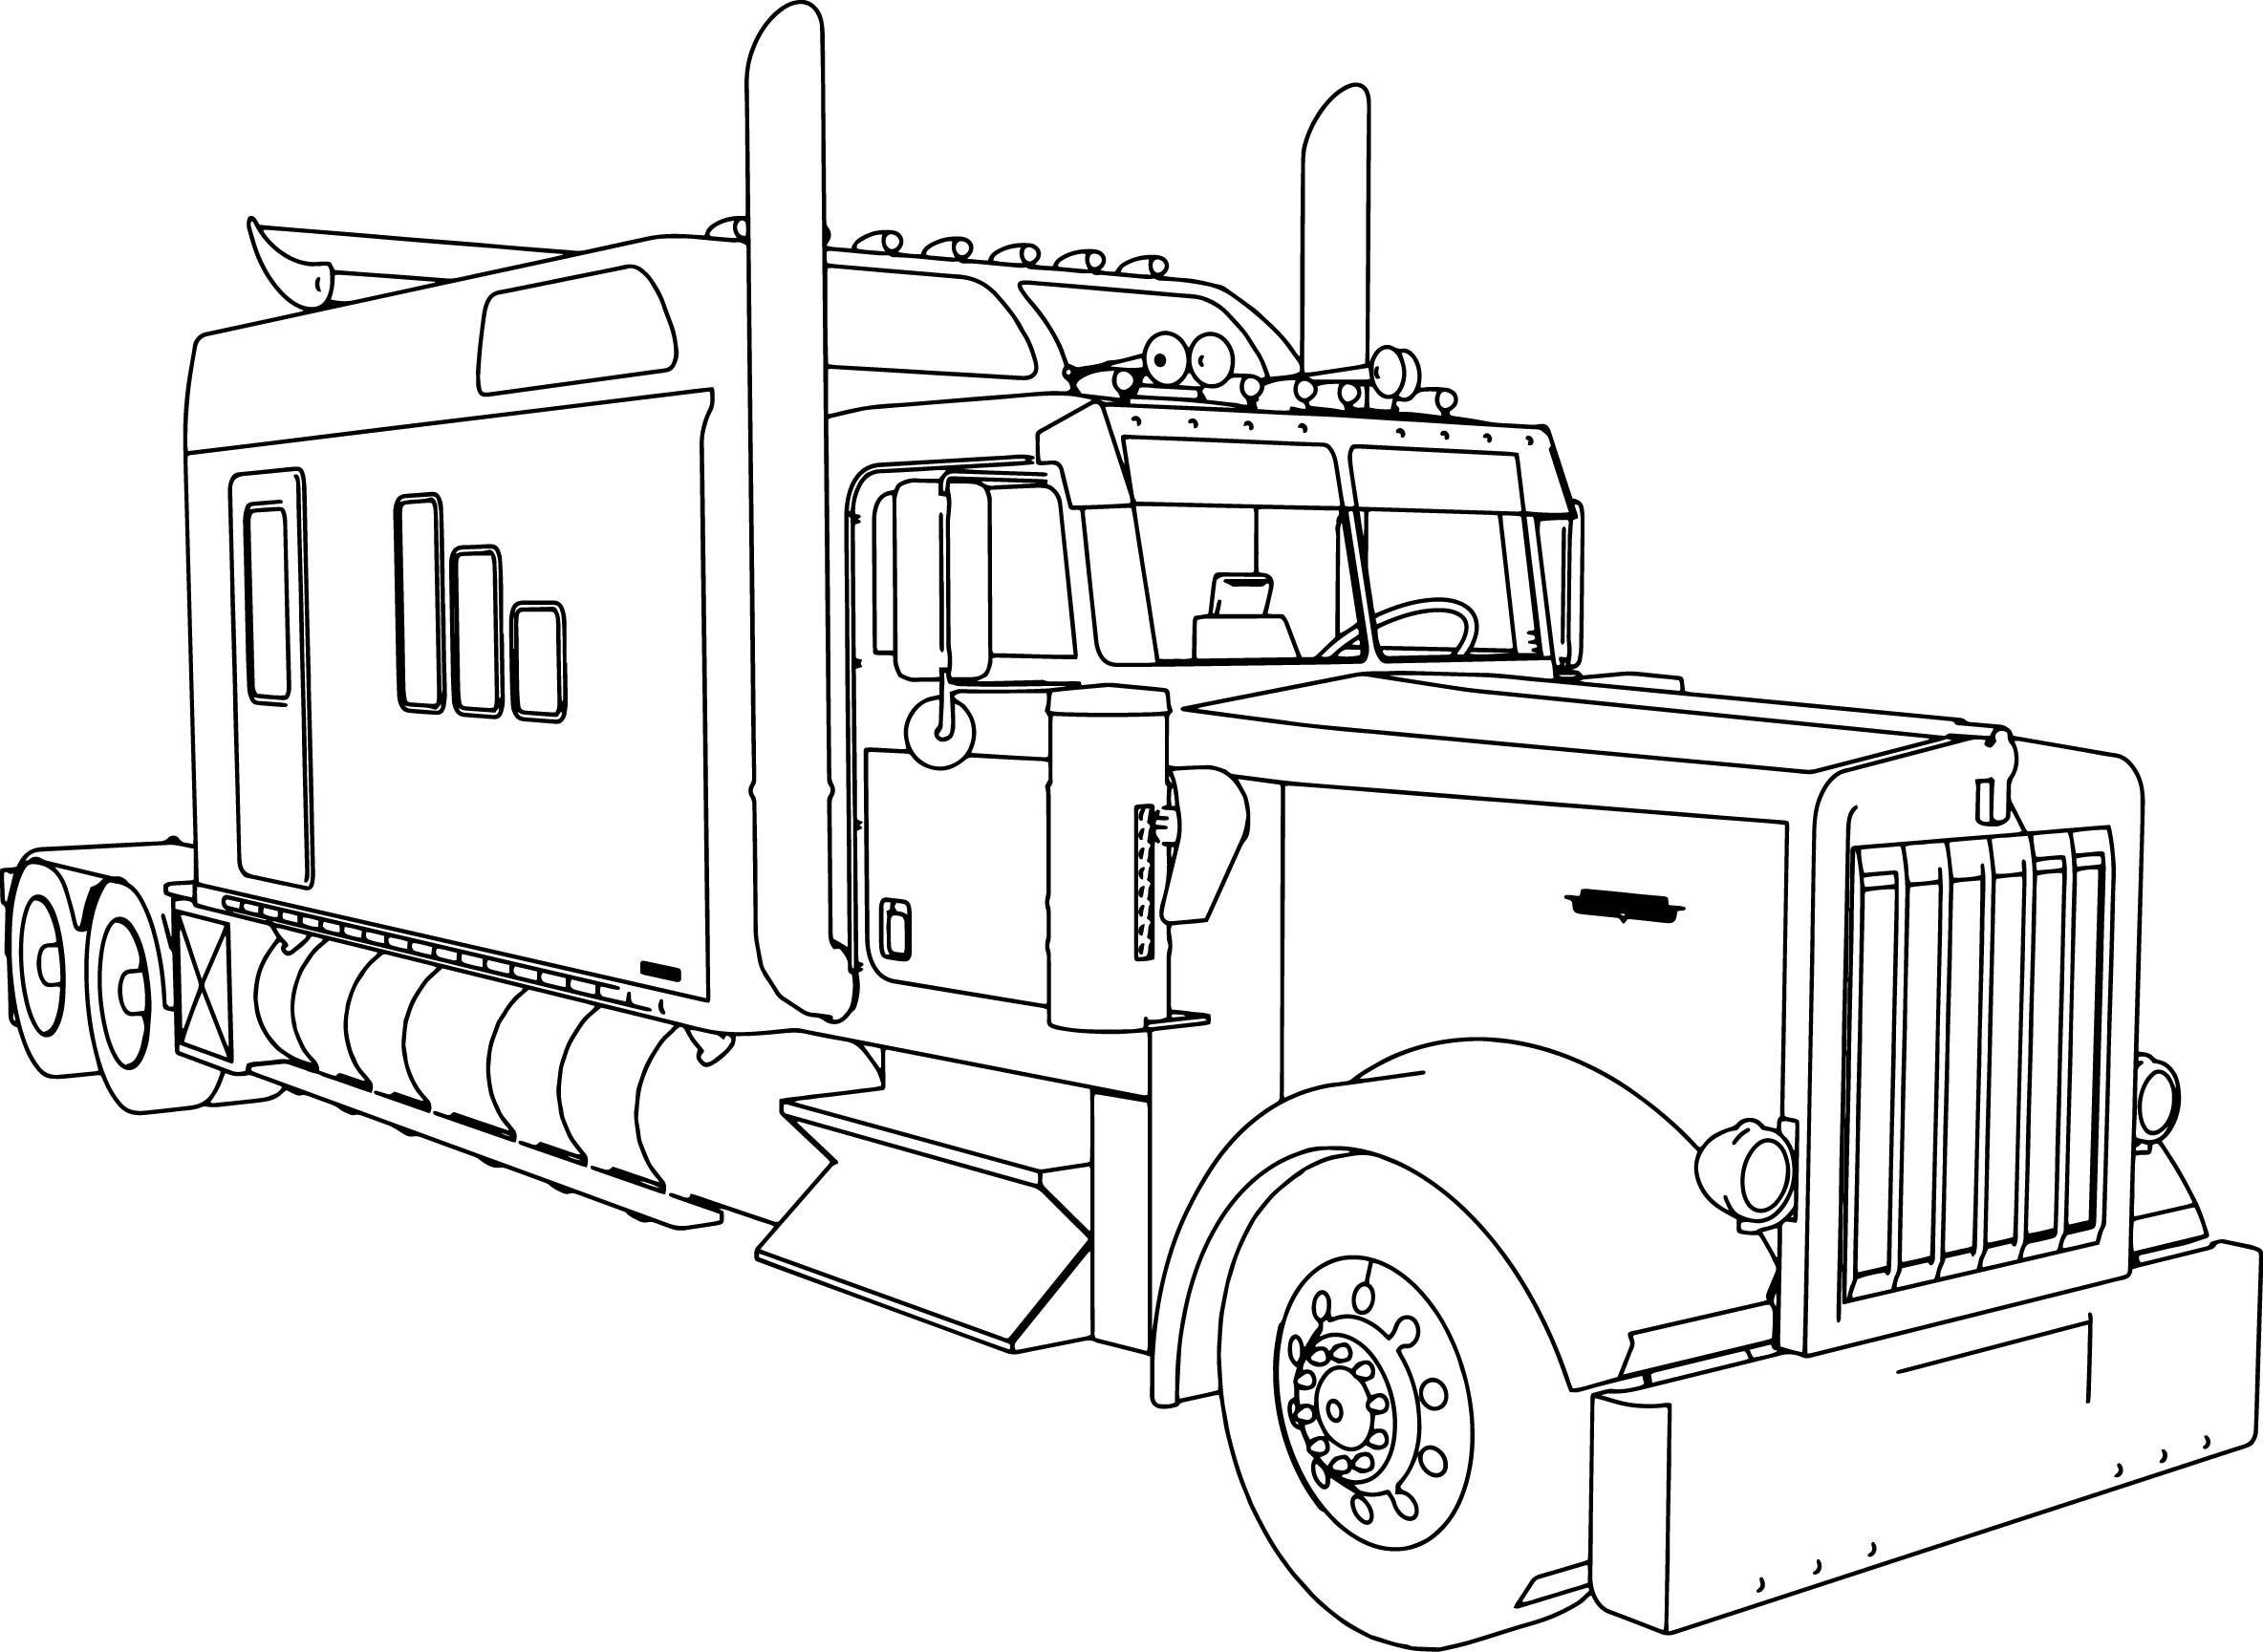 Peterbilt Semi Truck Coloring Page Drawing Sketch Sketch Coloring